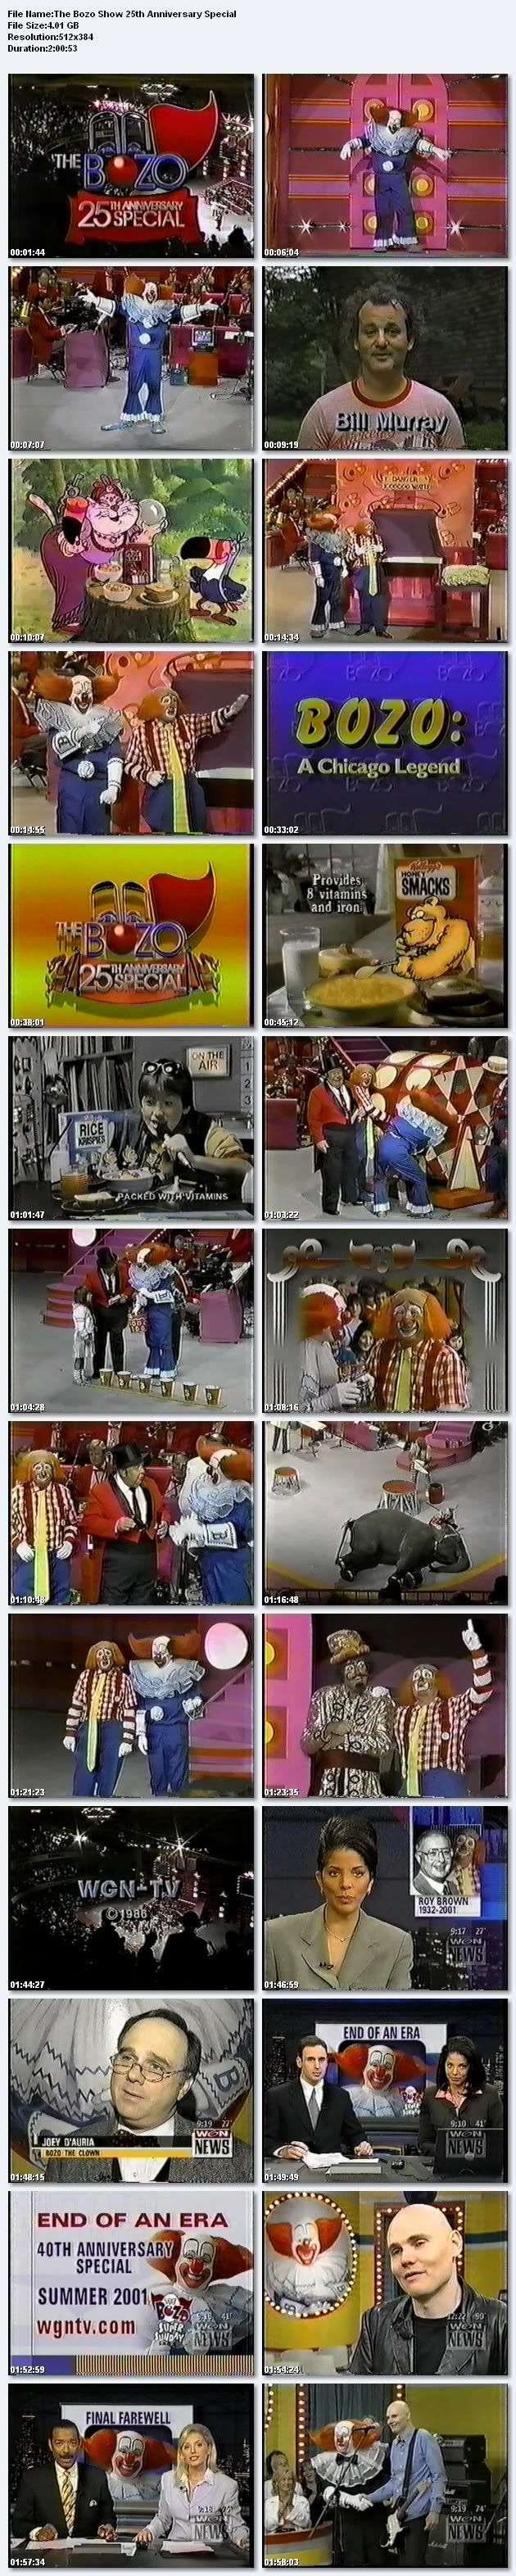 Bozo, Gar And Ray: Wgn Tv Classics | ... CIRCUS/BOZO SUPER SUNDAY SHOW-1960's/1970's/1980's/1990's/2000 TV SHOW